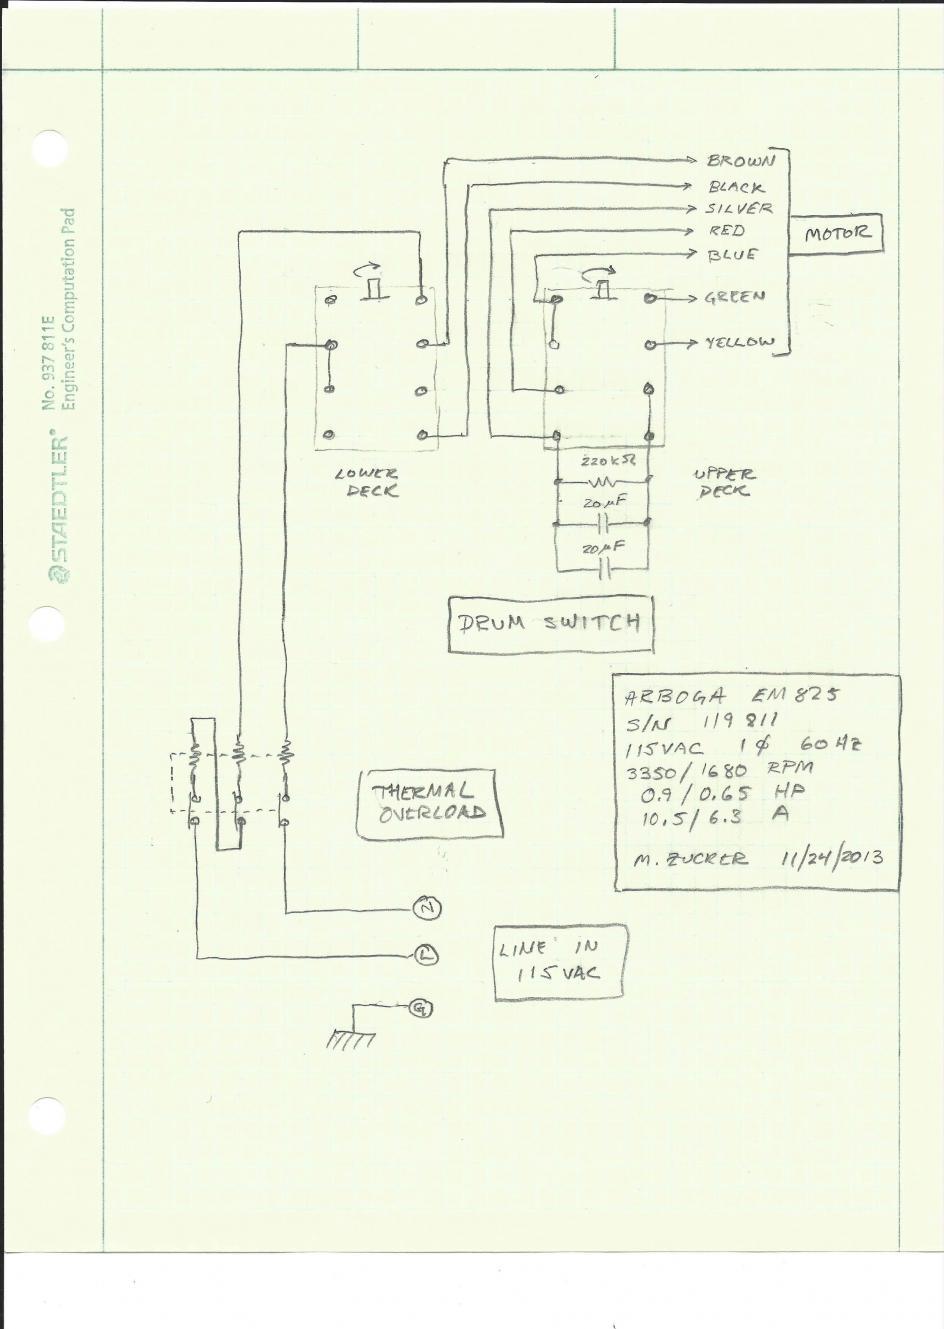 115 To 220 Wiring Diagrams 1968 Beetle Wiring Diagram Begeboy Wiring Diagram Source